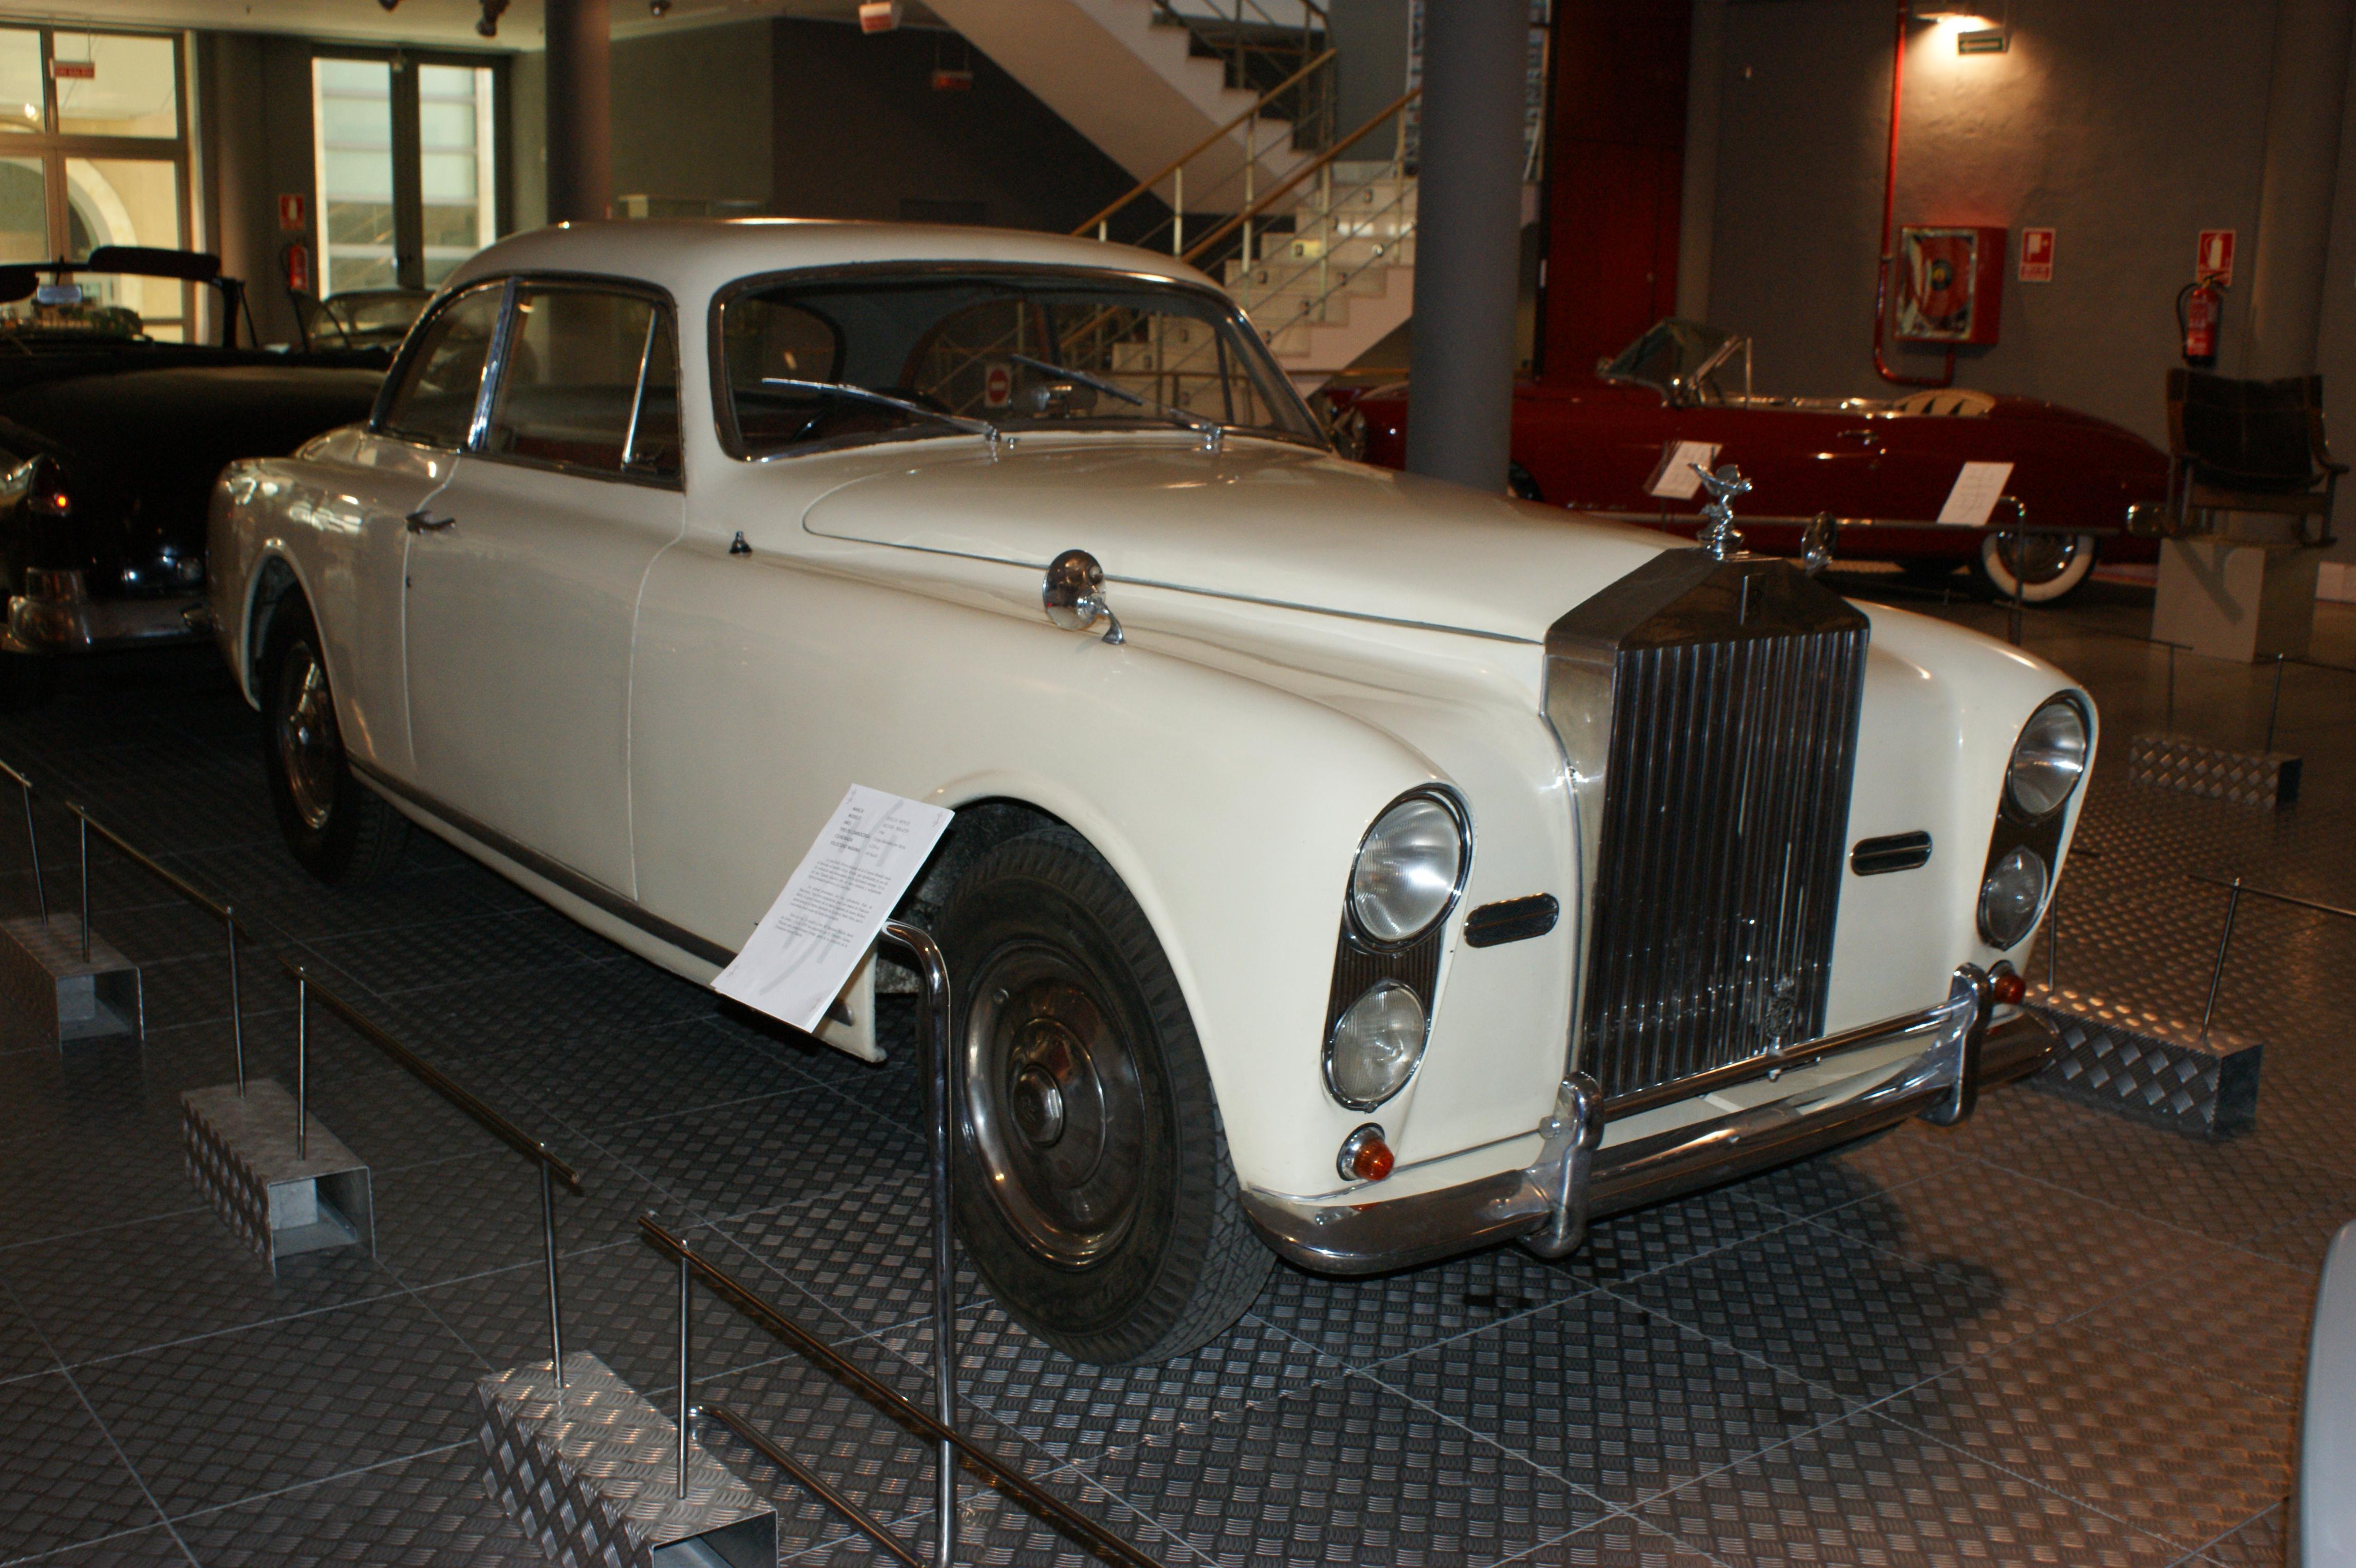 Rolls Royce Wraith Wikipedia Rolls Royce Silver Wraith 4.2